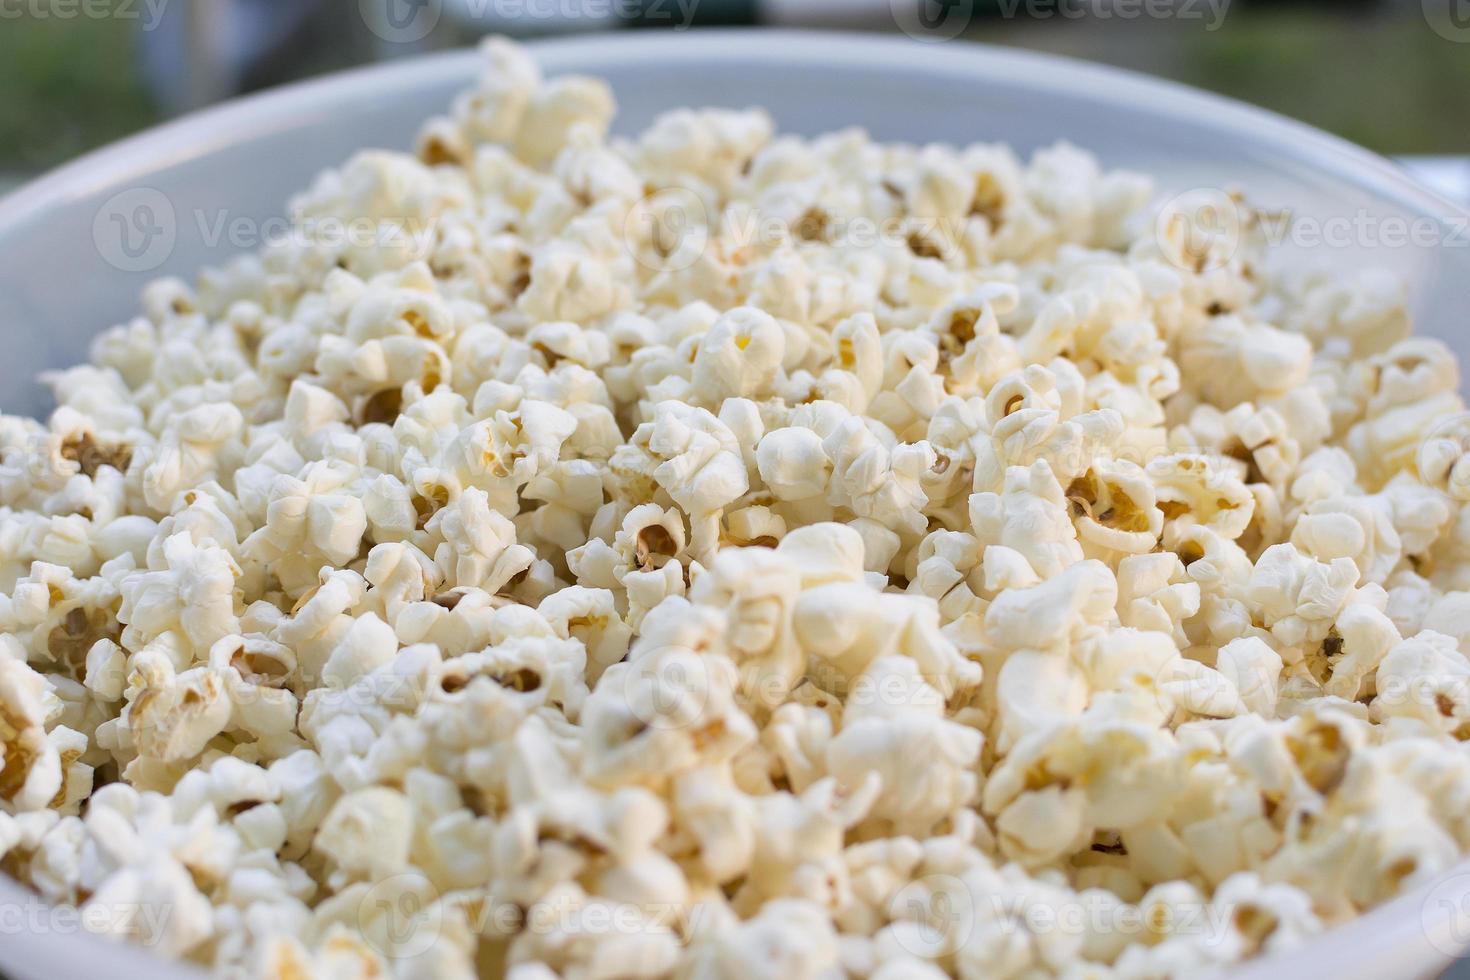 Popcorn photo